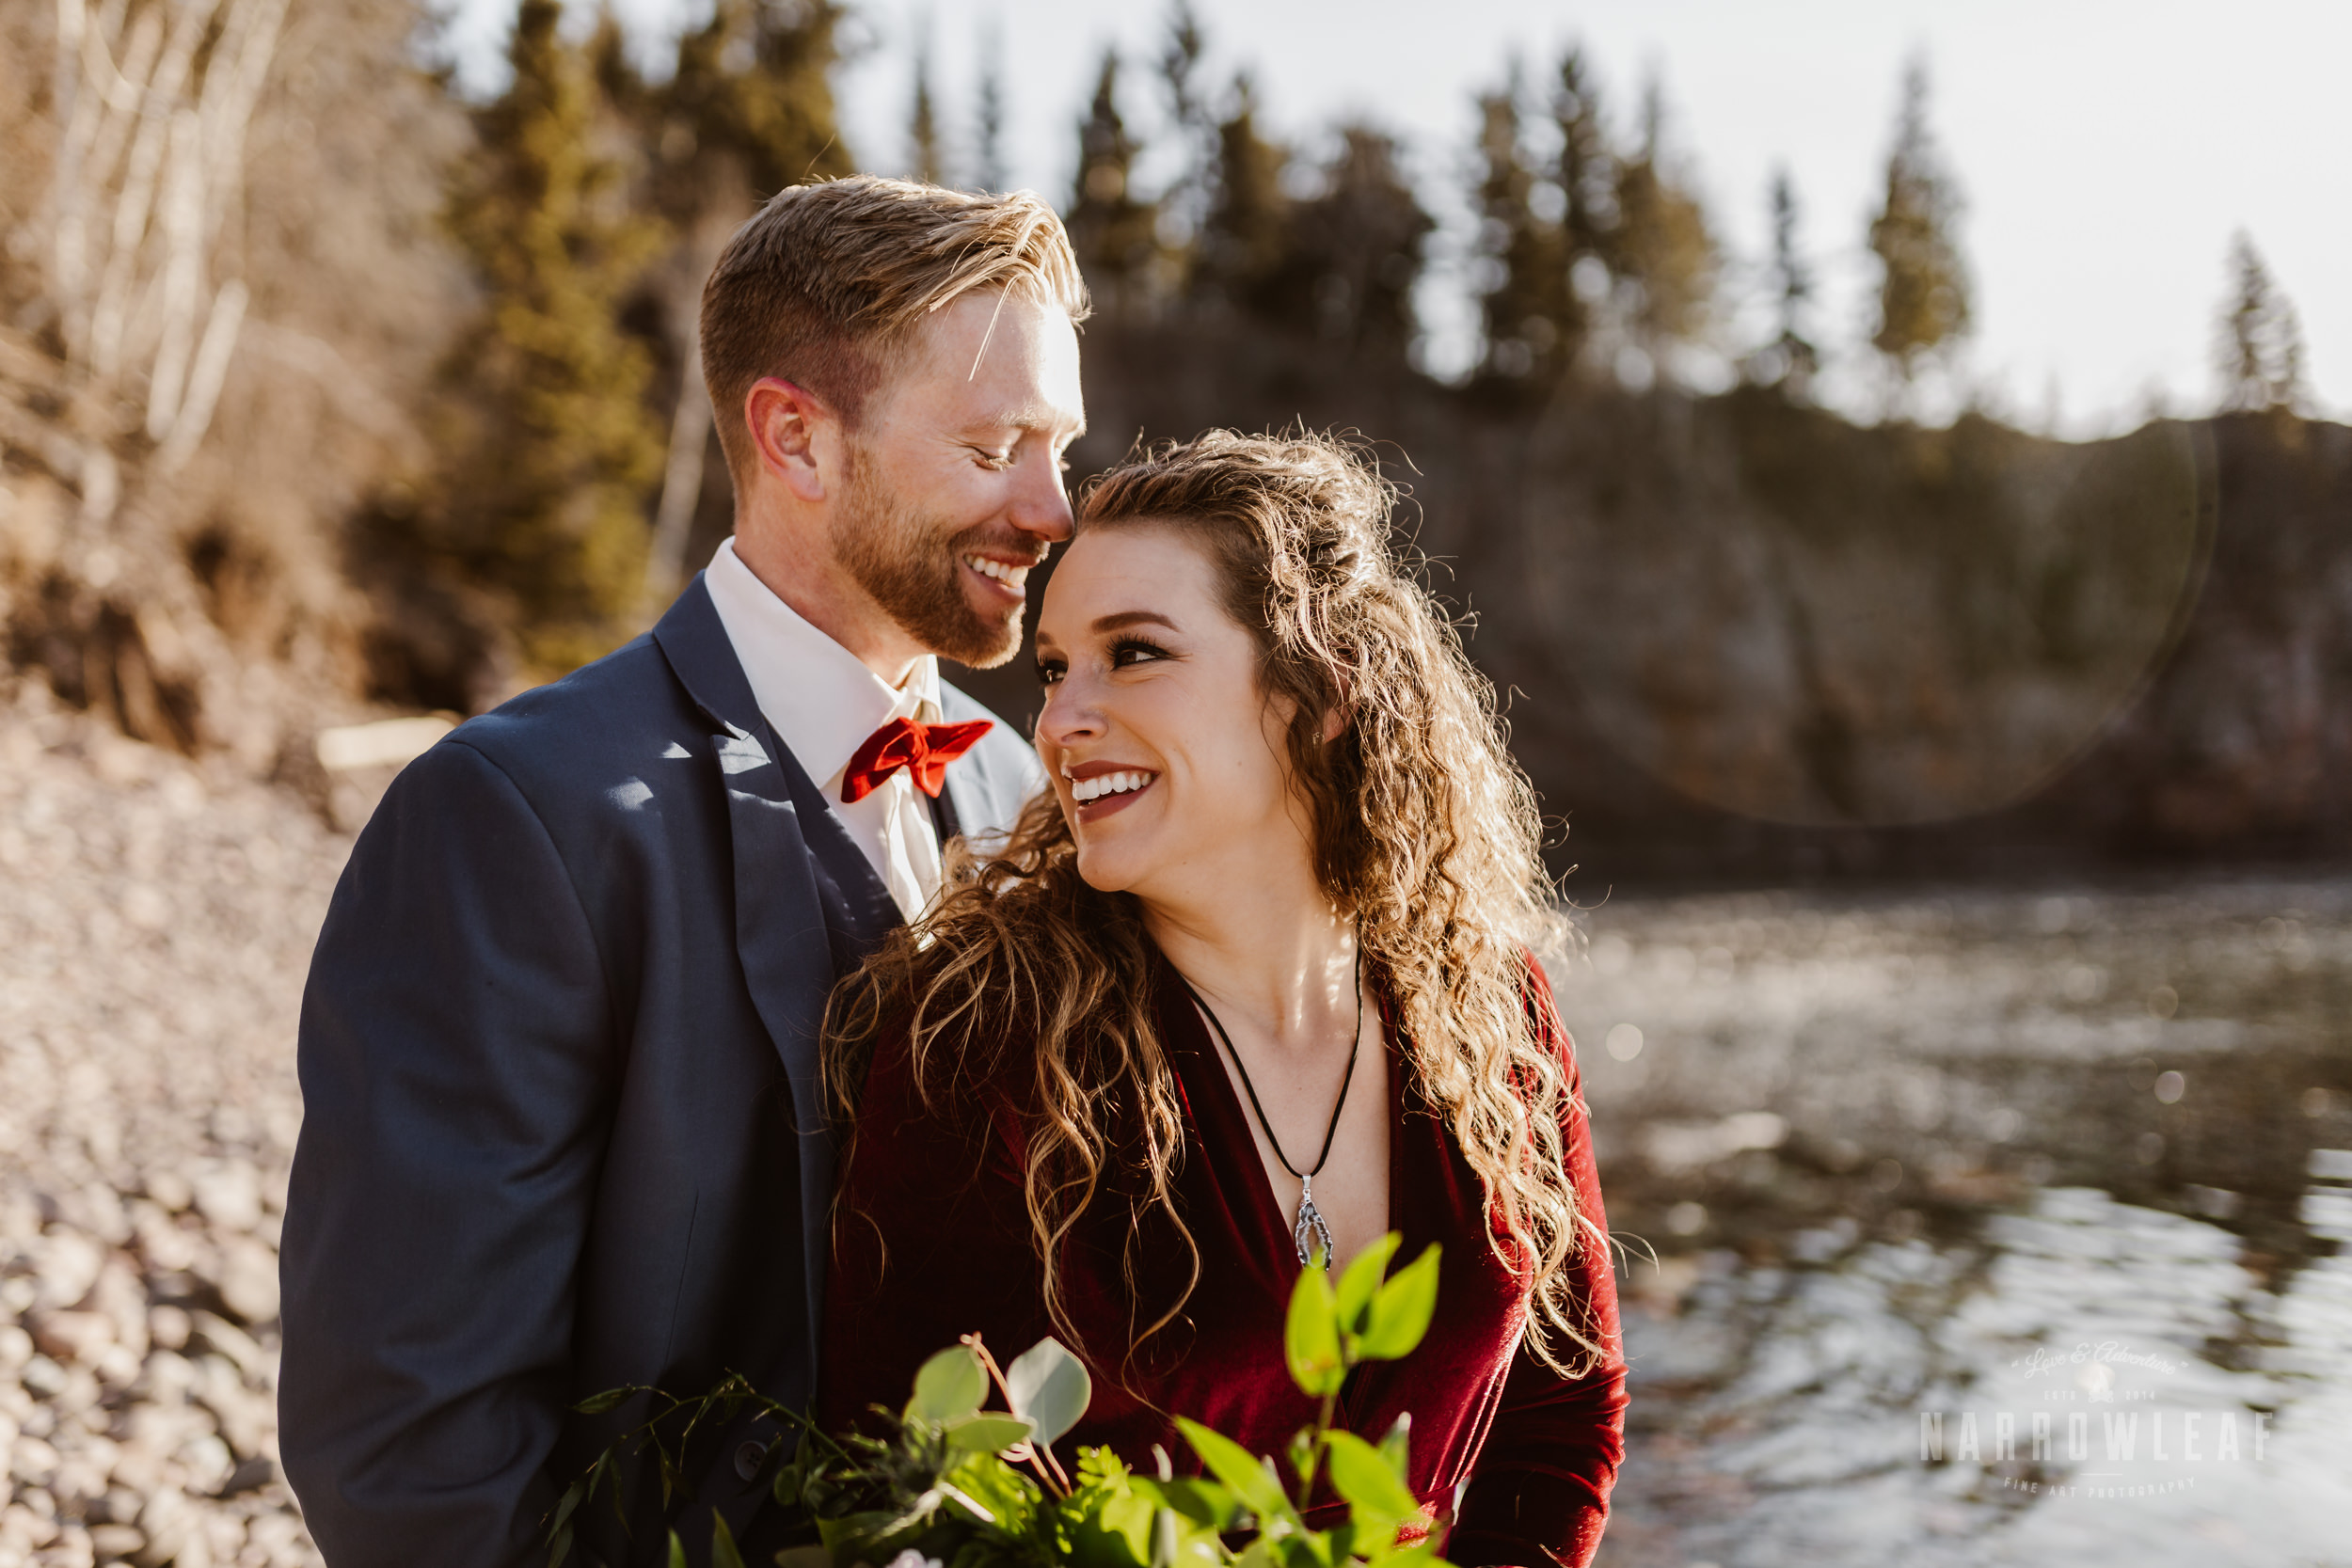 minnesota-adventure-elopement-Narrowleaf_Love_and_Adventure_Photography-8964.jpg